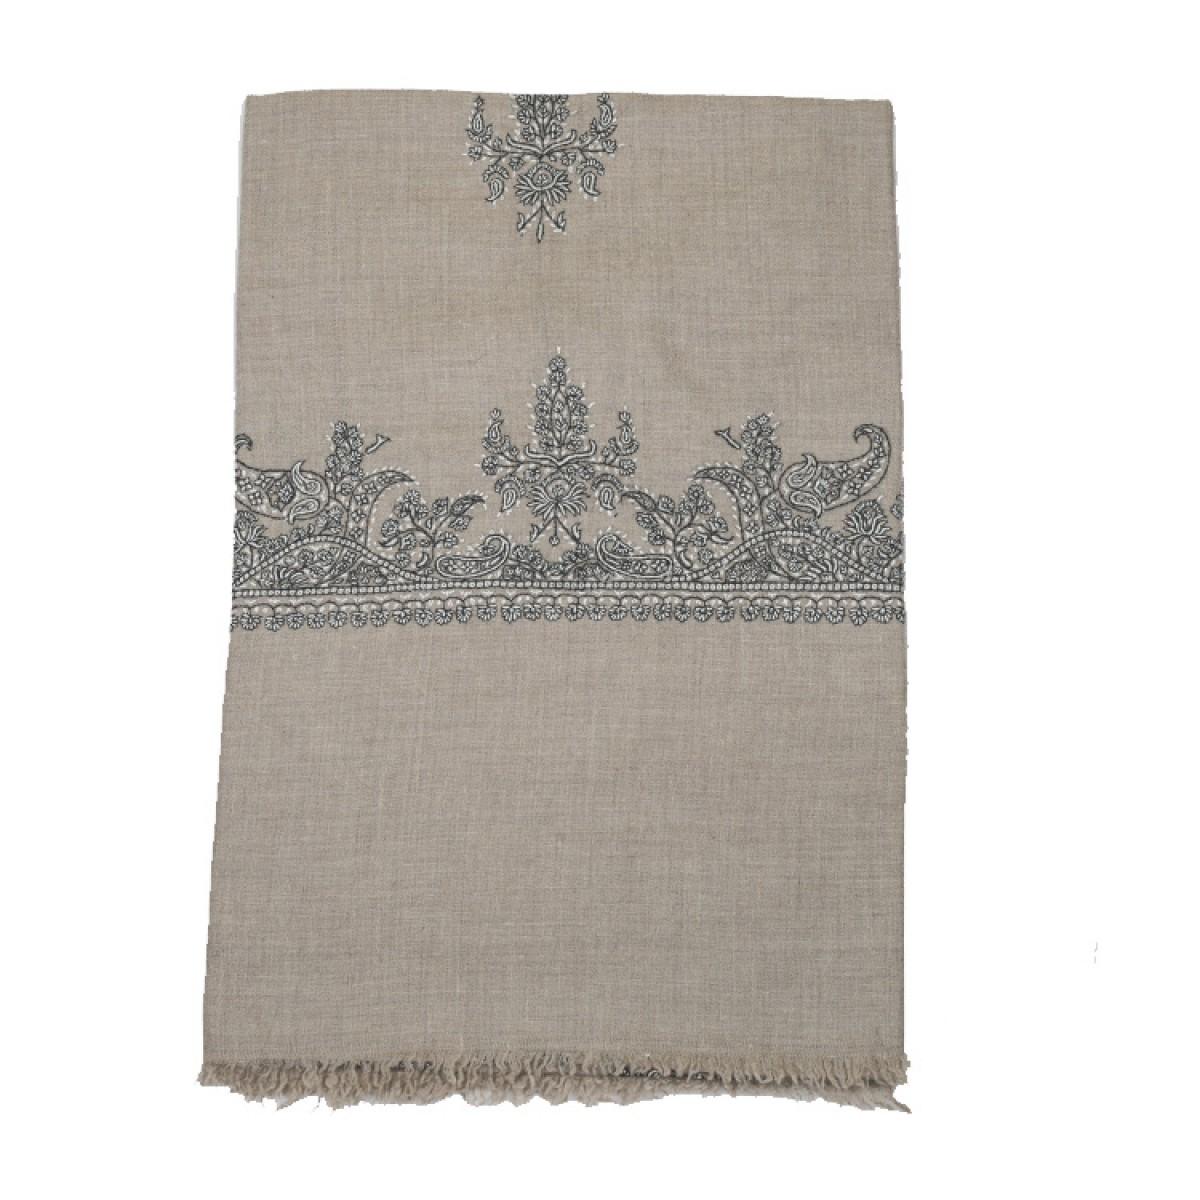 Embroidered Pashmina Shawl - Natural